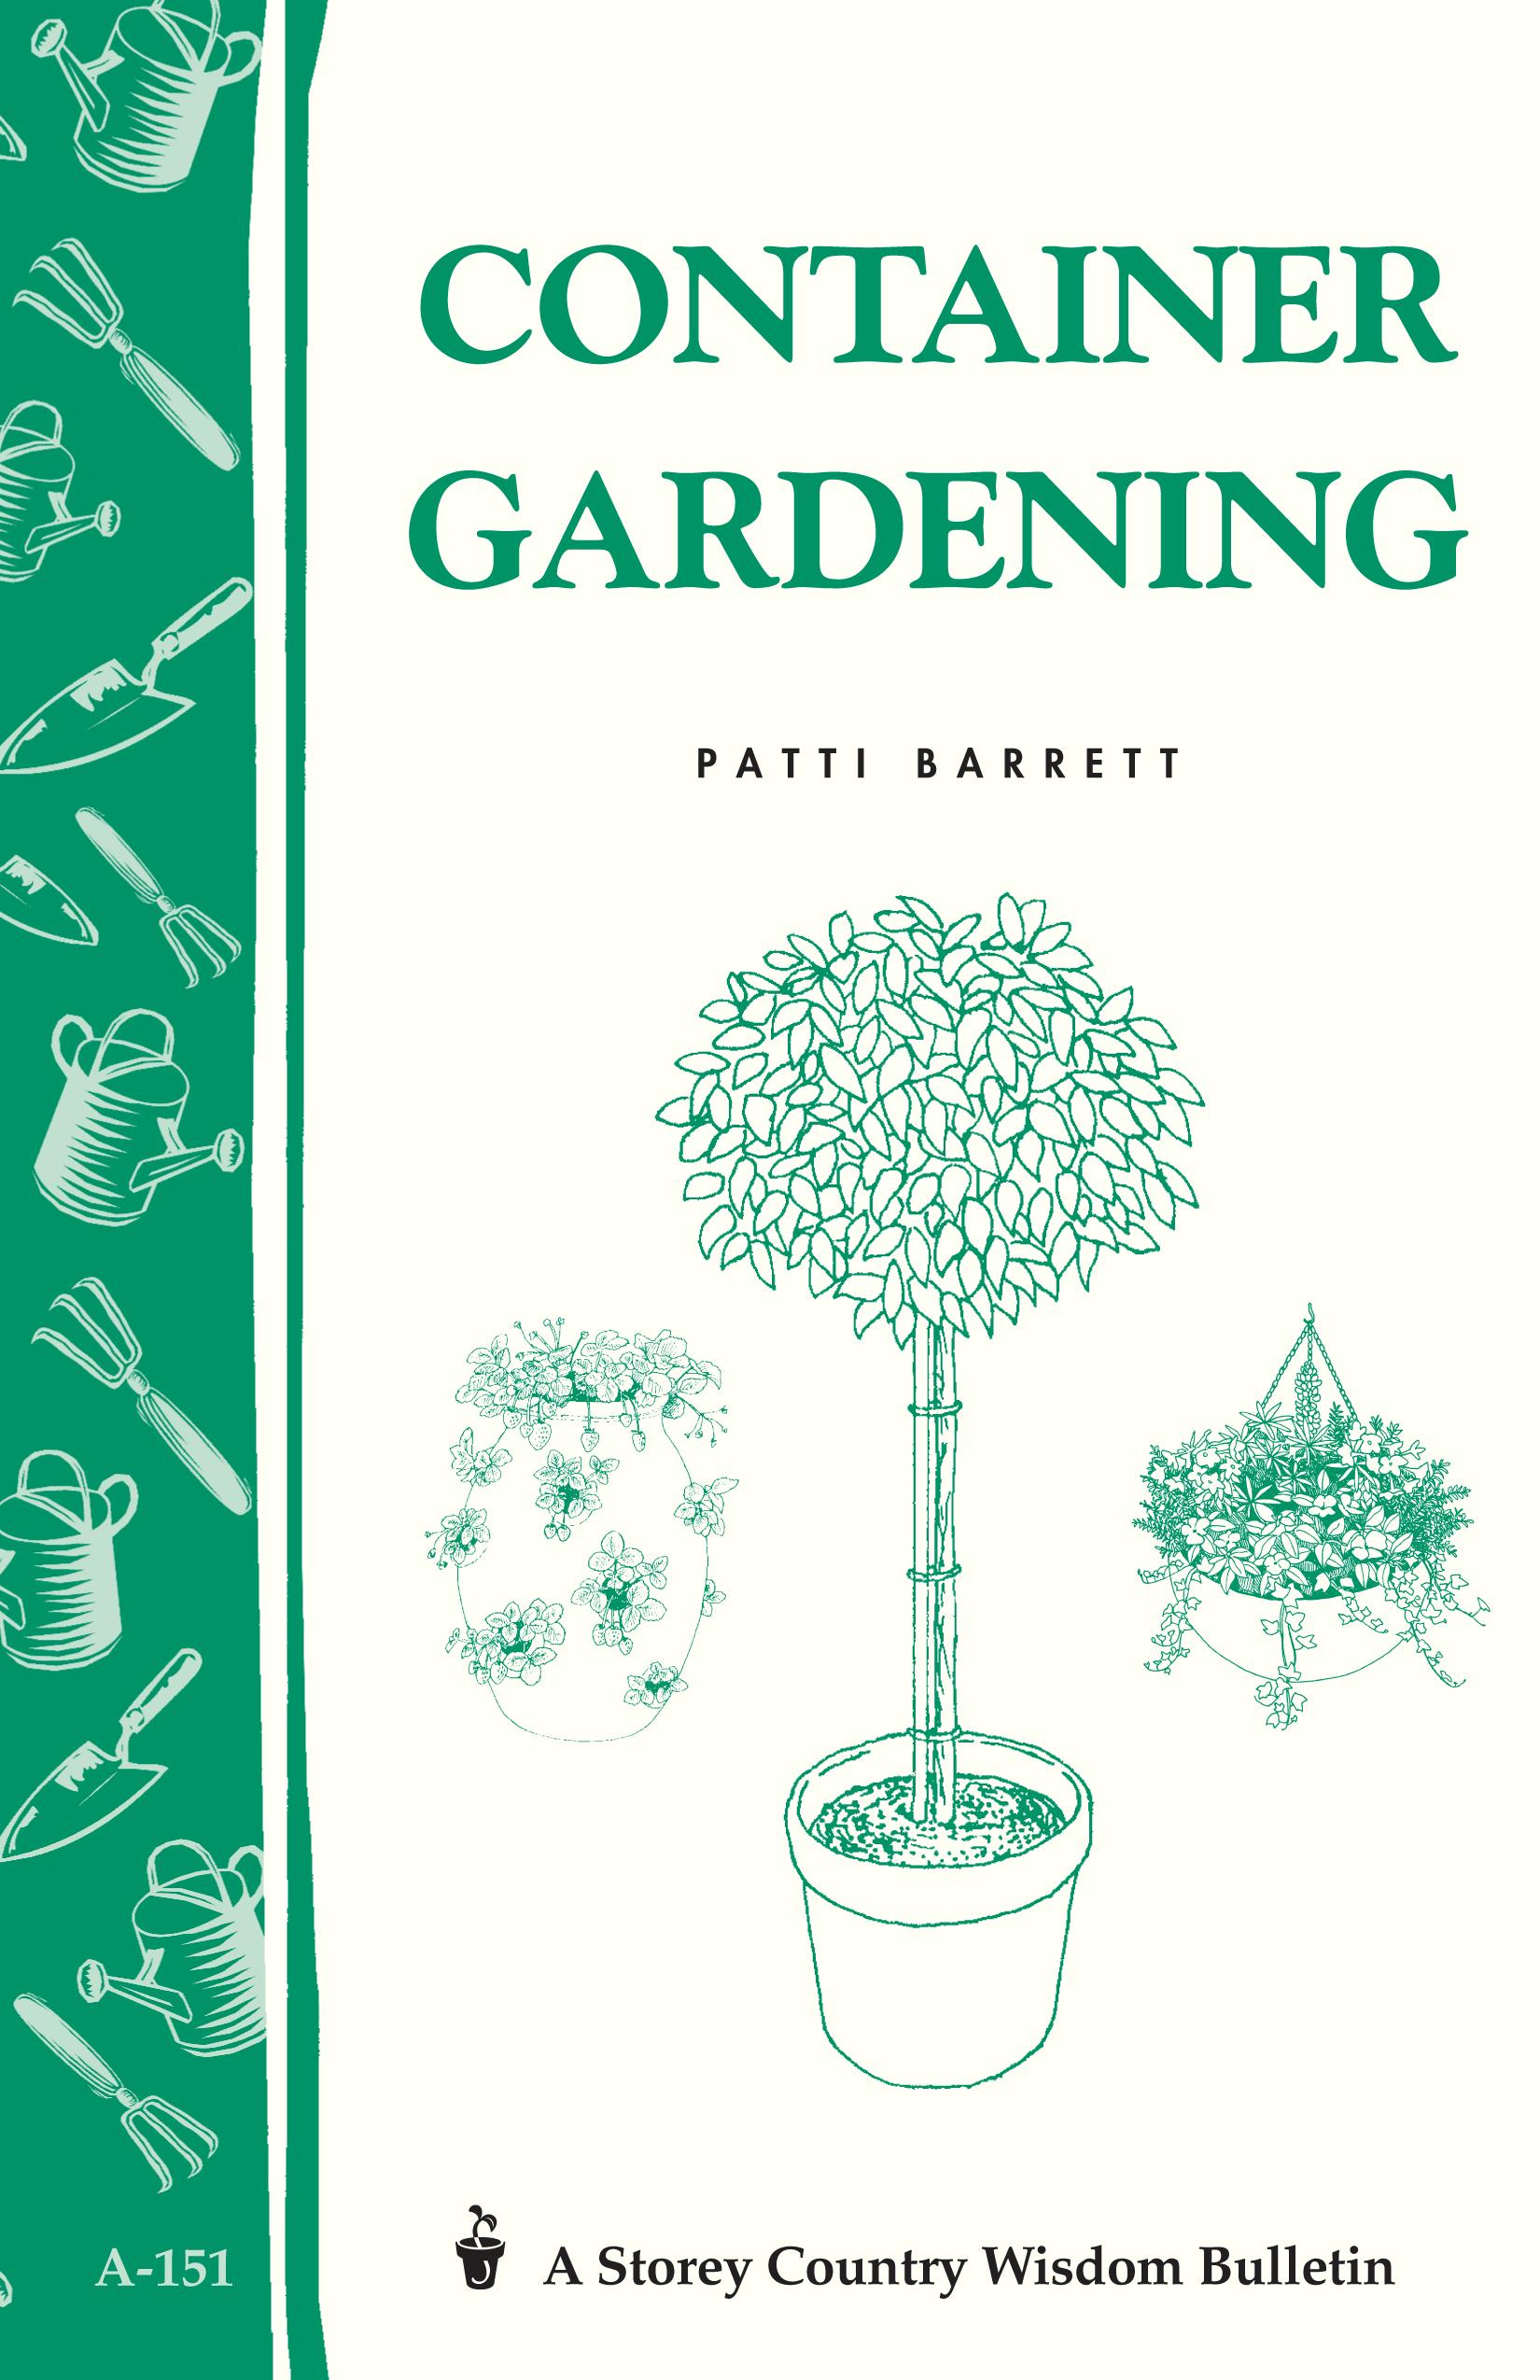 Container Gardening Storey Country Wisdom Bulletin A-151 - Patricia R. Barrett